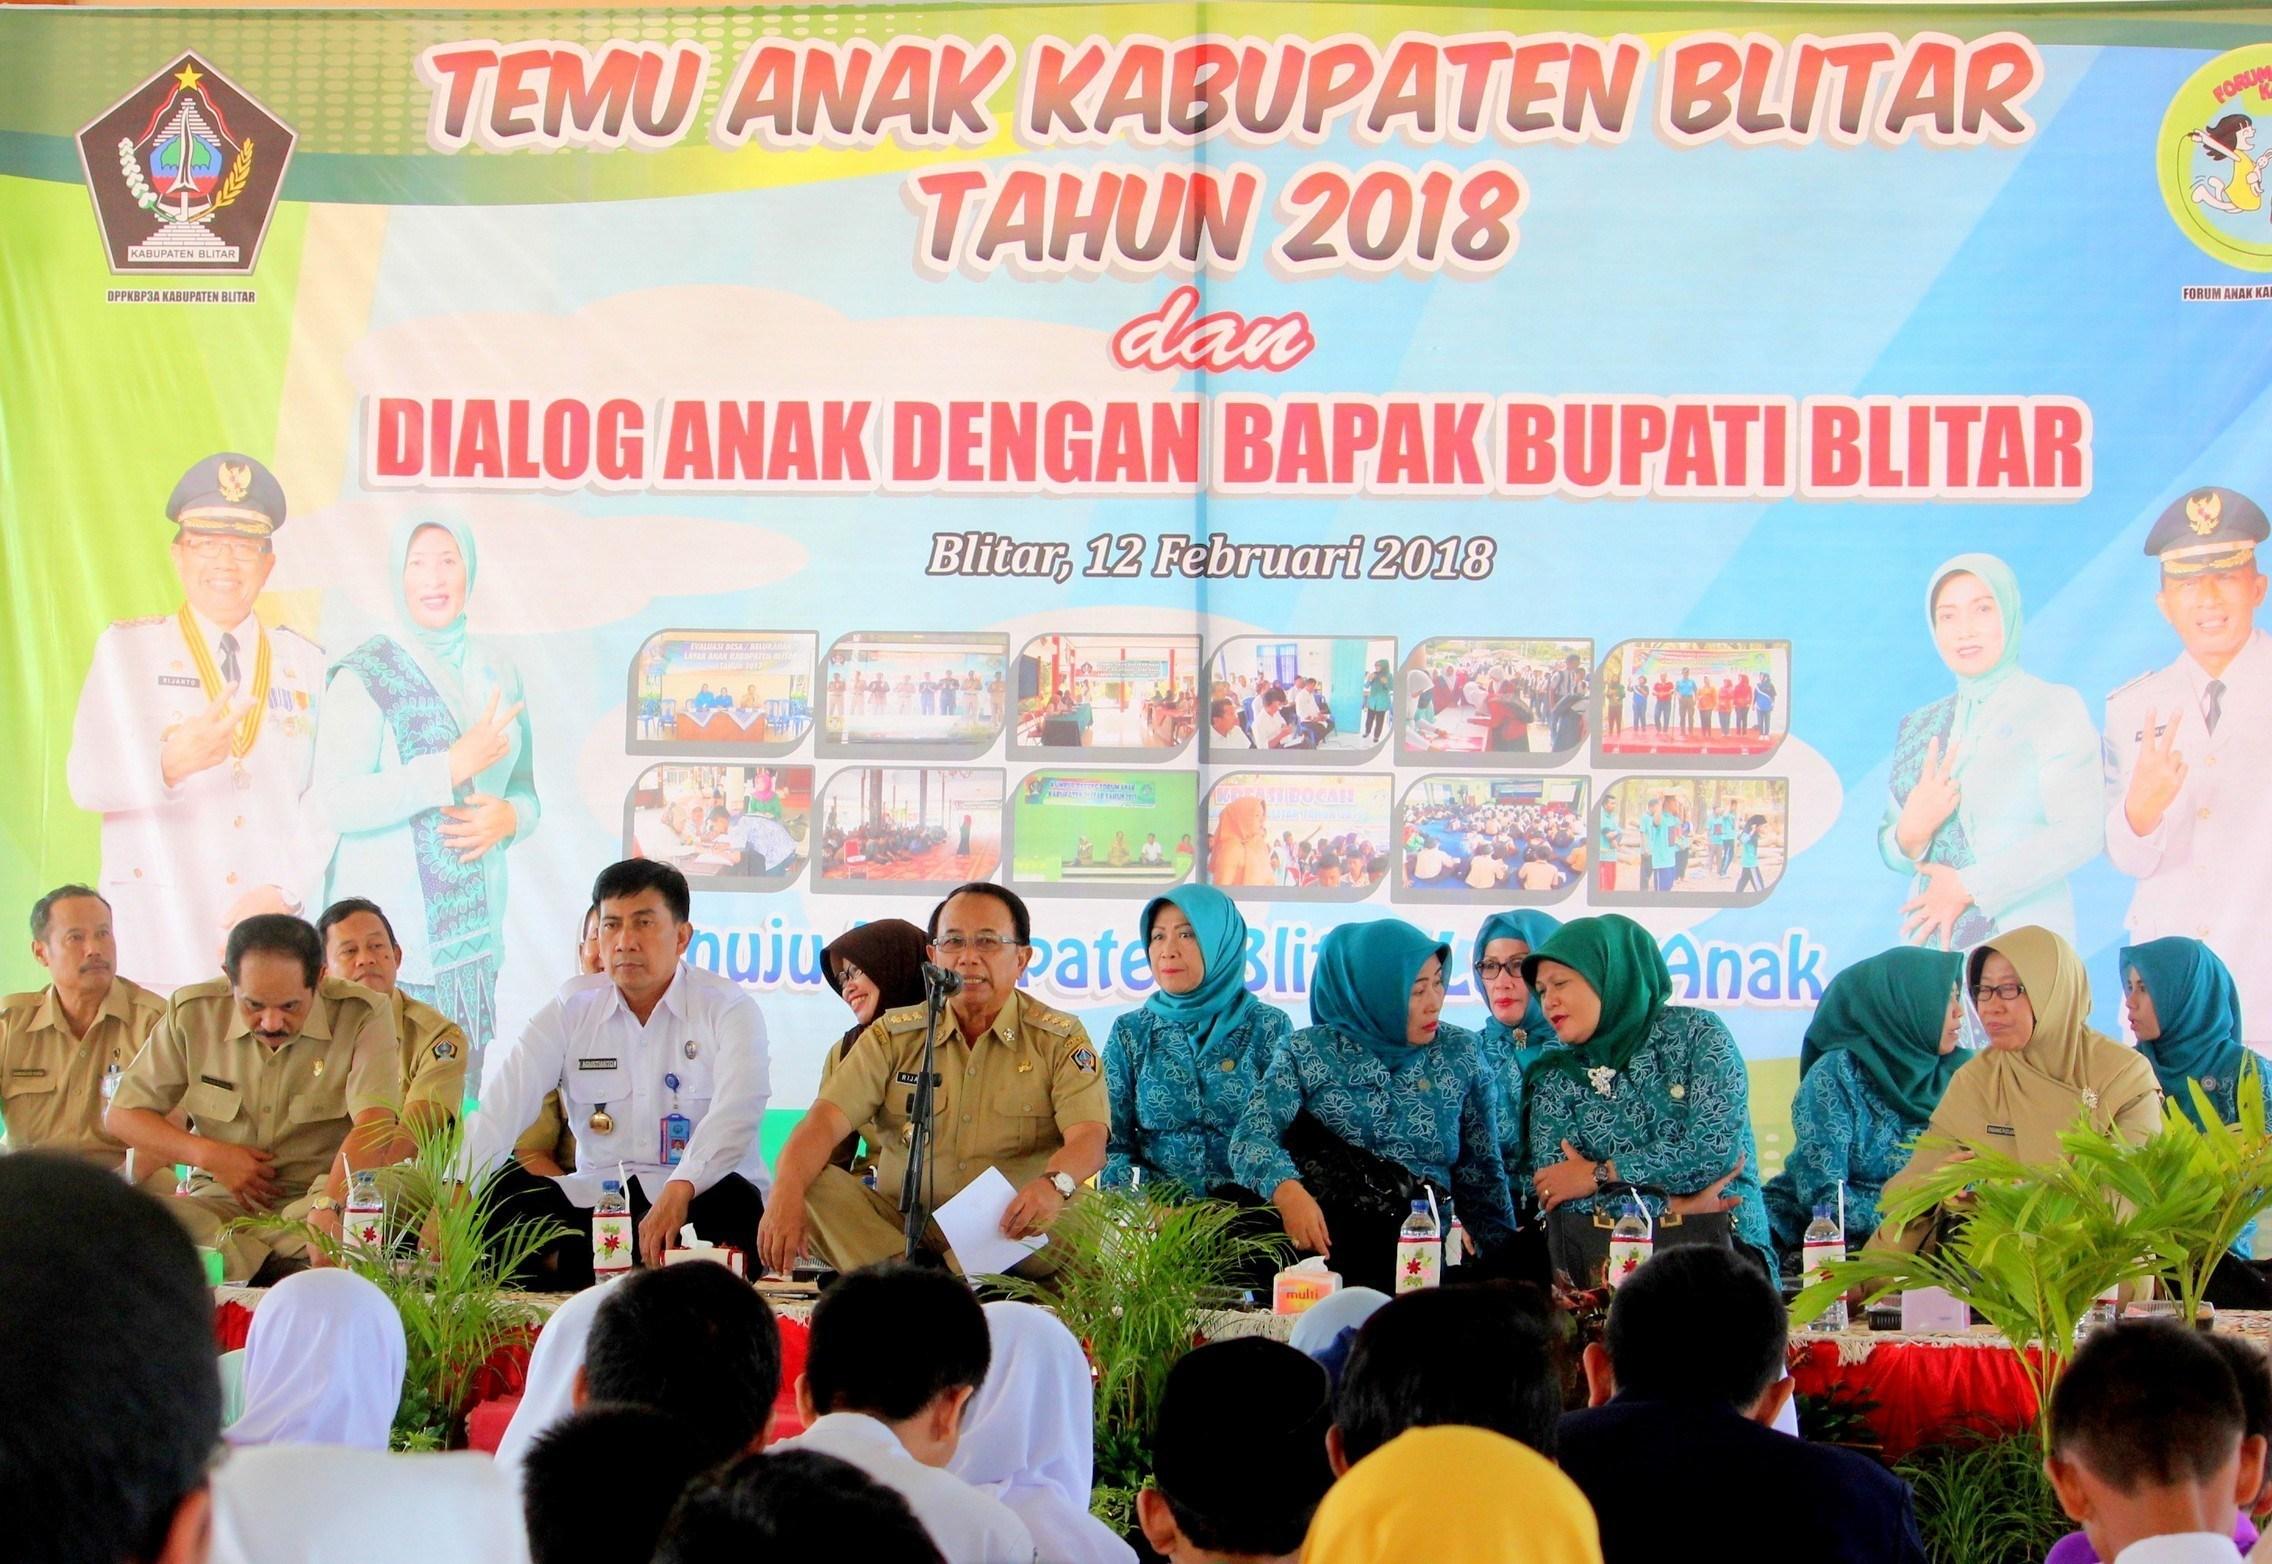 Bupati Blitar Bangga Forum Anak Kritis Inofatif Zegra Kab